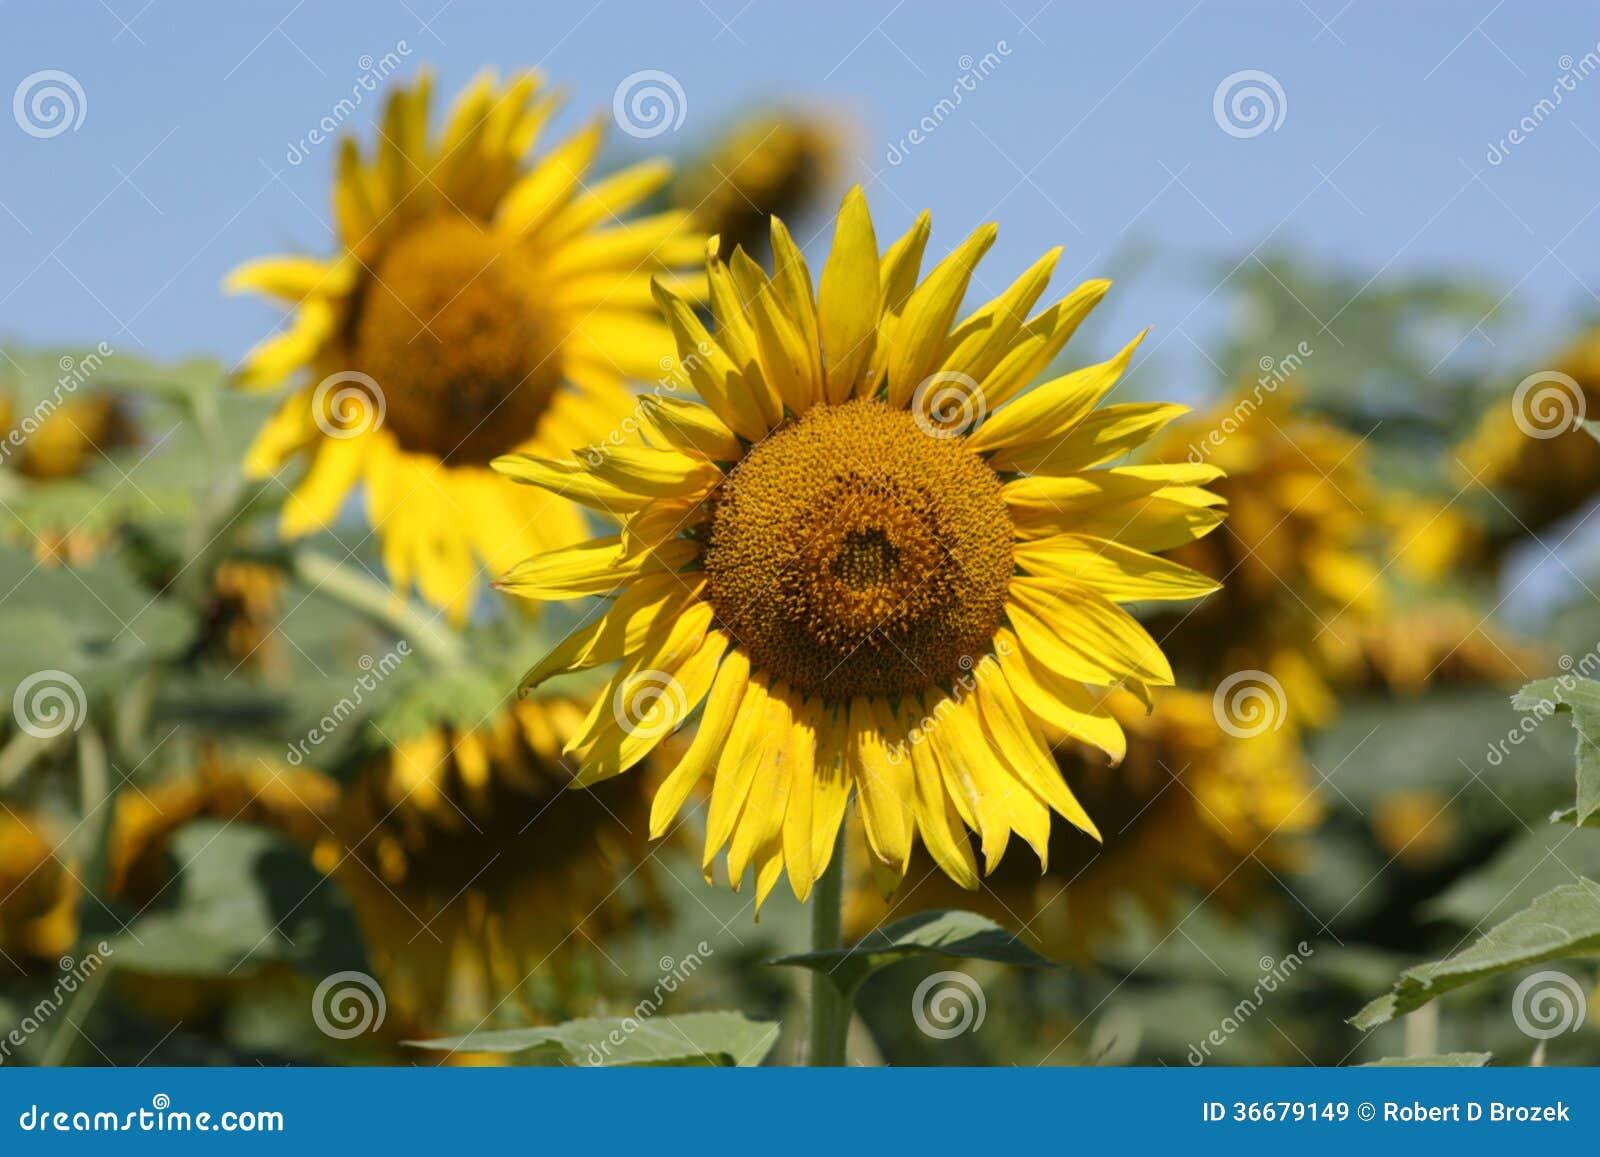 Kansas Country Sunflower closeup